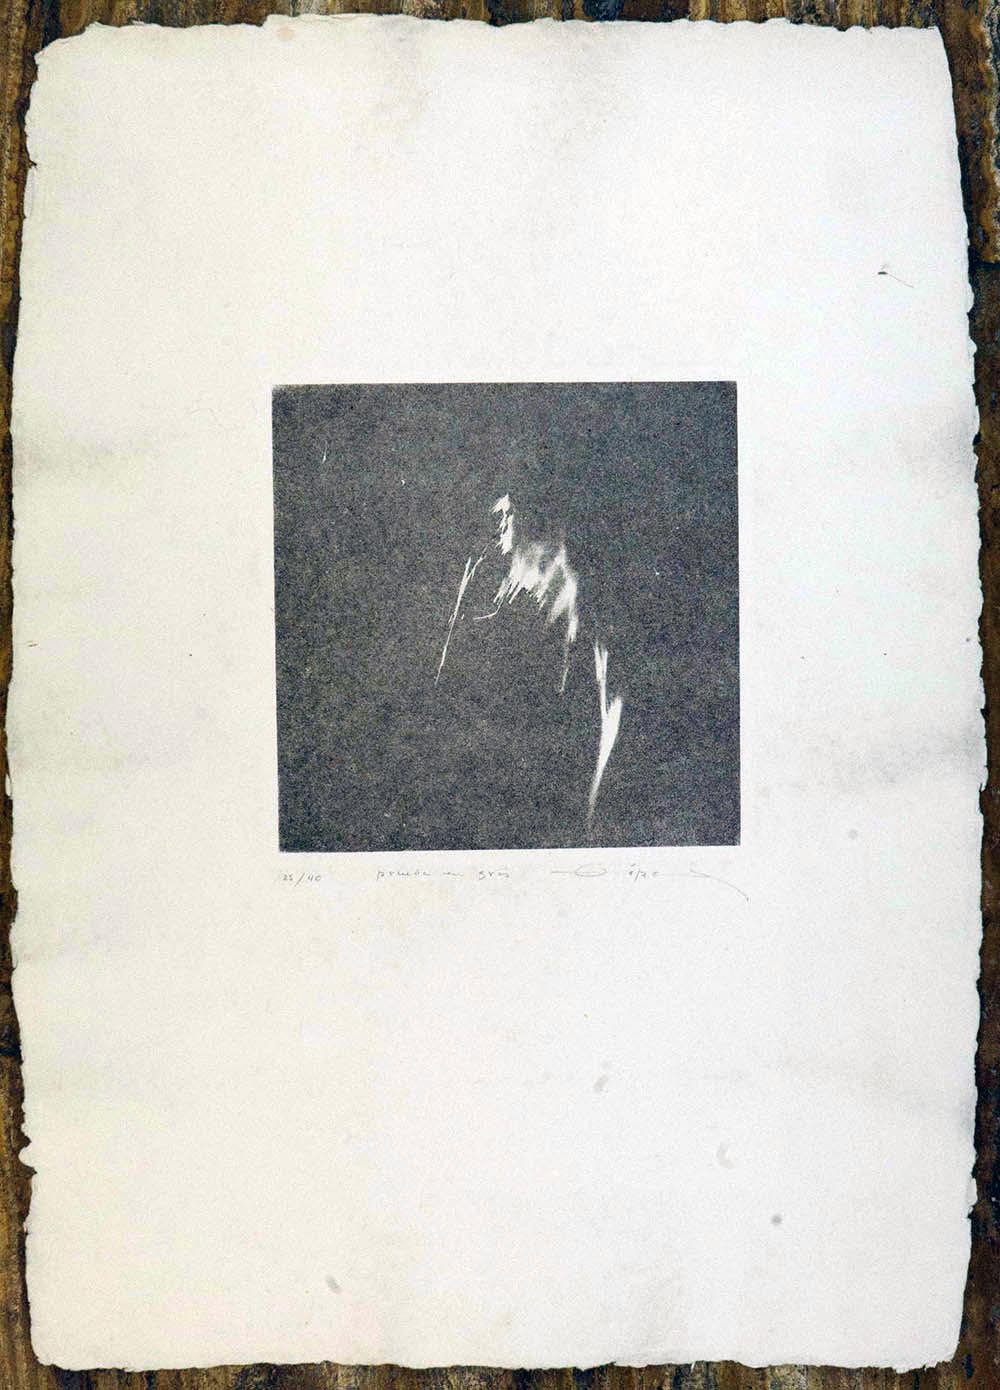 Prueba en gris, 1978